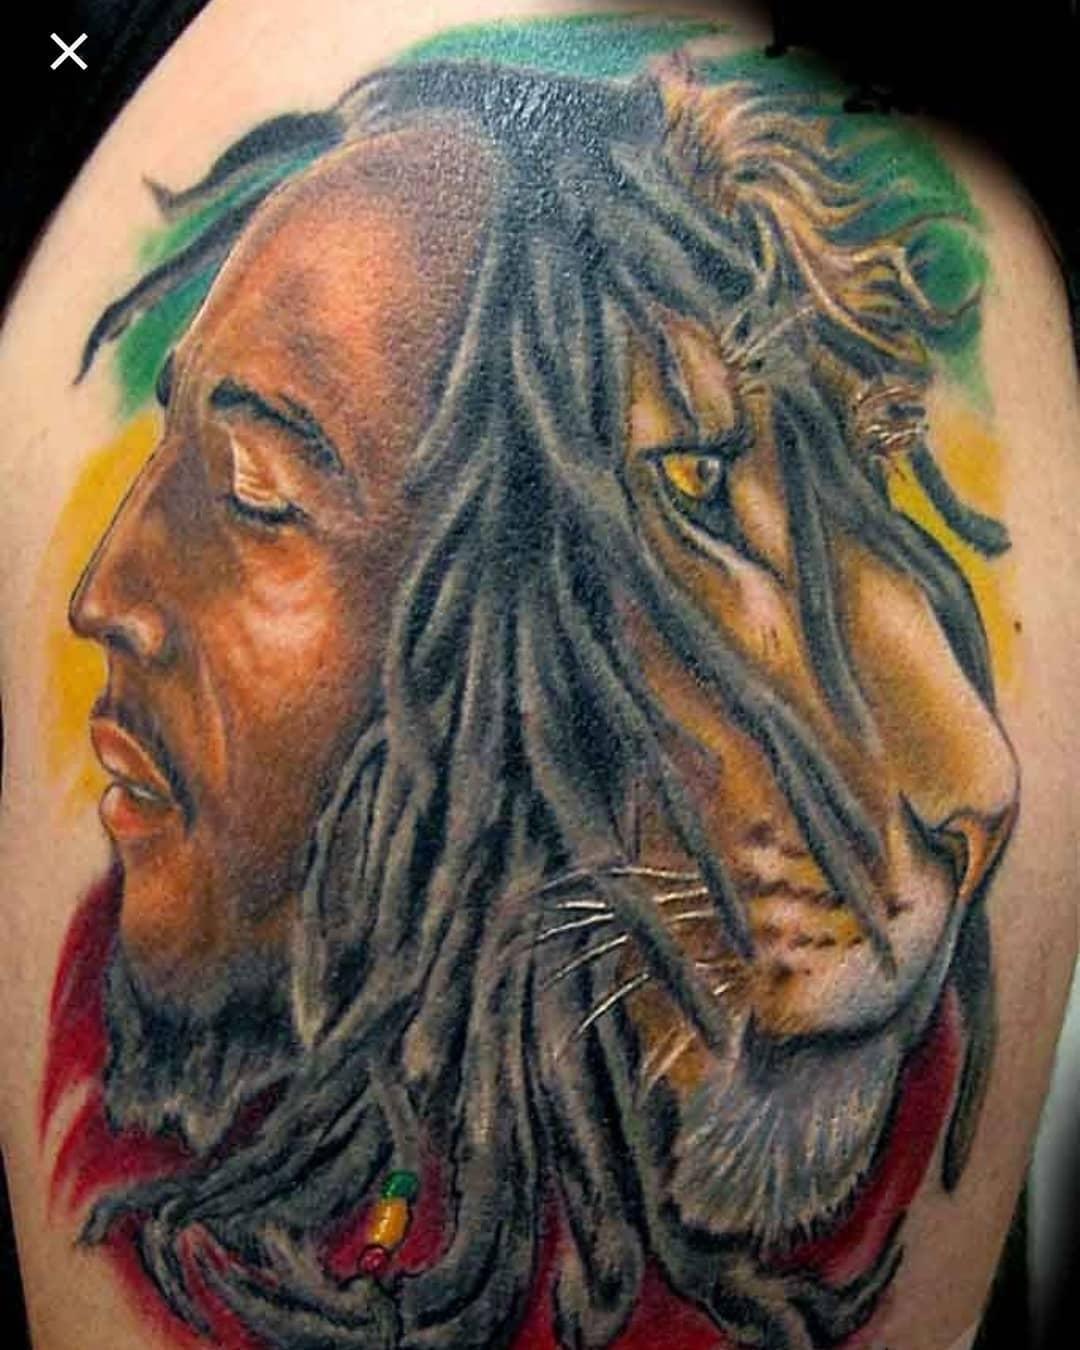 Bob Marly Weed Tattoo Design